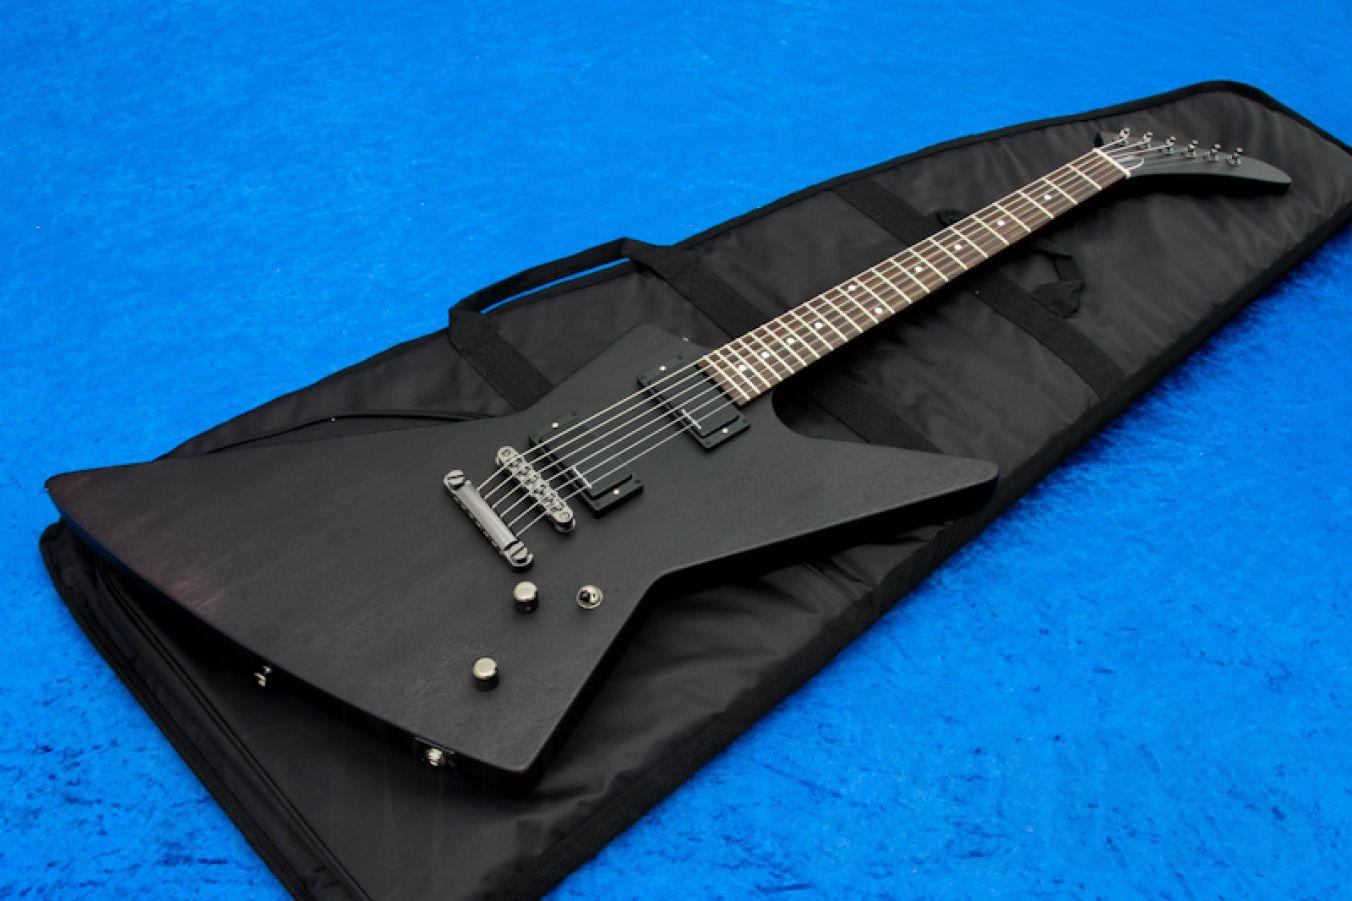 ESP Edwards E-EX-110D SCB - Stain Cloudy Black